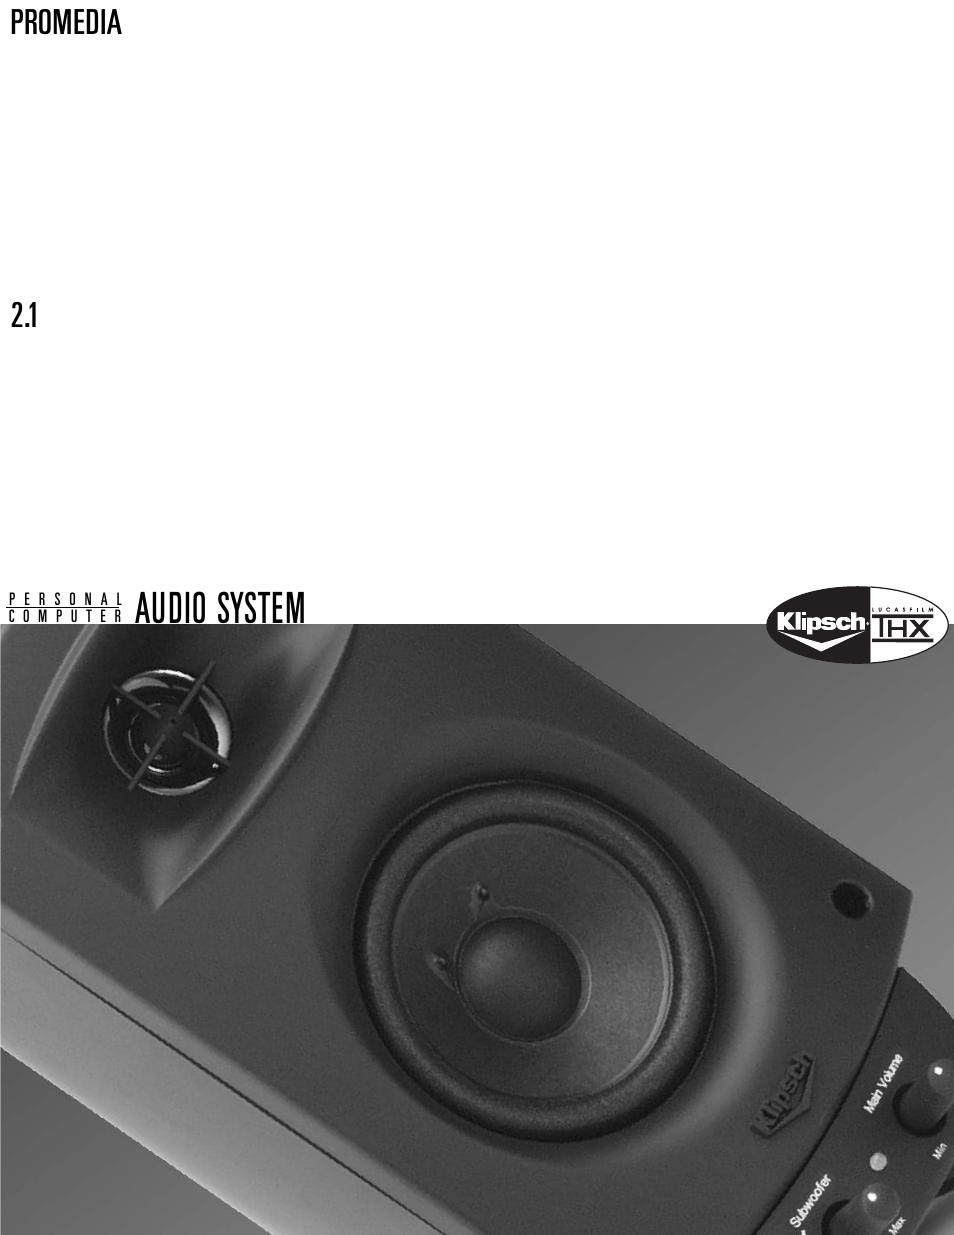 86 21 Promedia Klipsch Wiring Diagram 2 1 9 Pin Din Connector Ultra 5 Thx User Manual